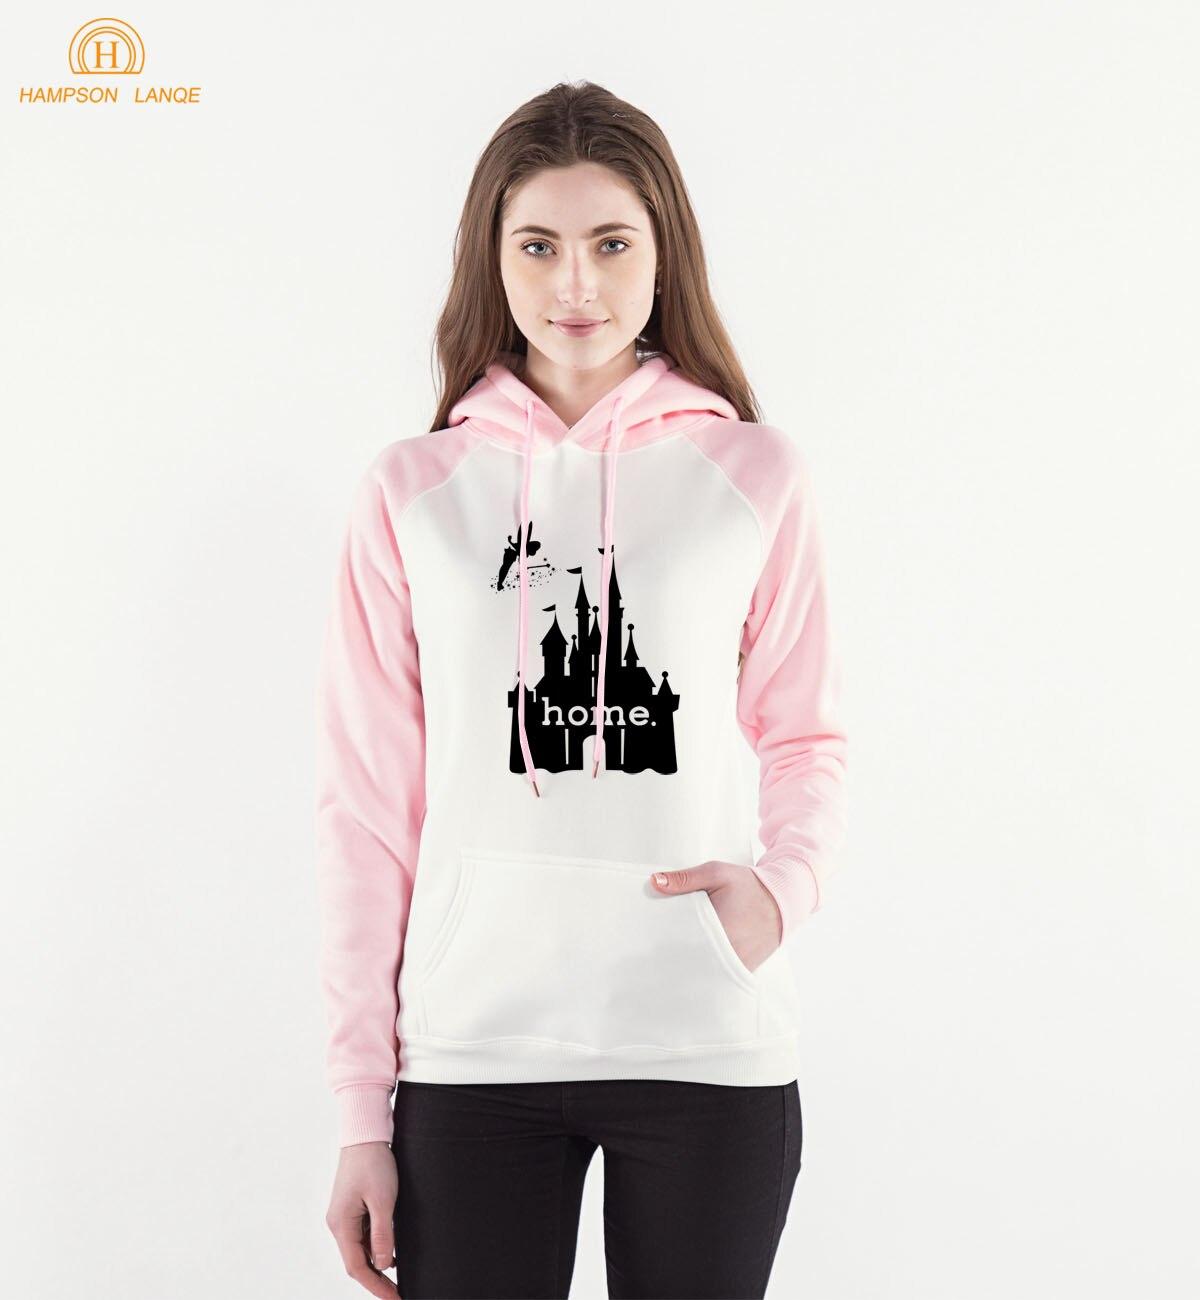 Home House Castle Print Kawaii Pink Hoodies 2018 Spring Autumn Womens Sweatshirts Kpop Style Raglan Hoodie Harajuku Sweatshirt